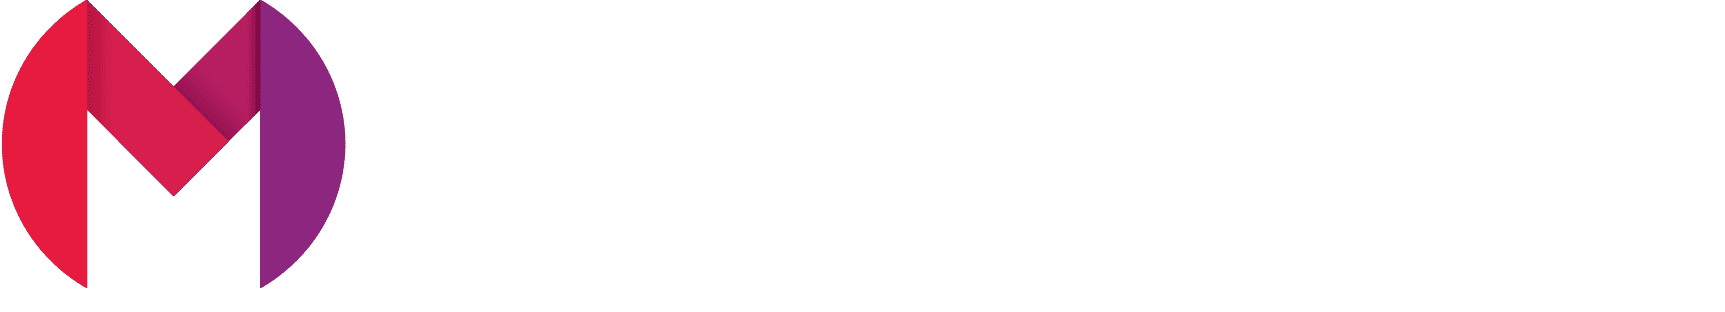 Micro Biz Mag